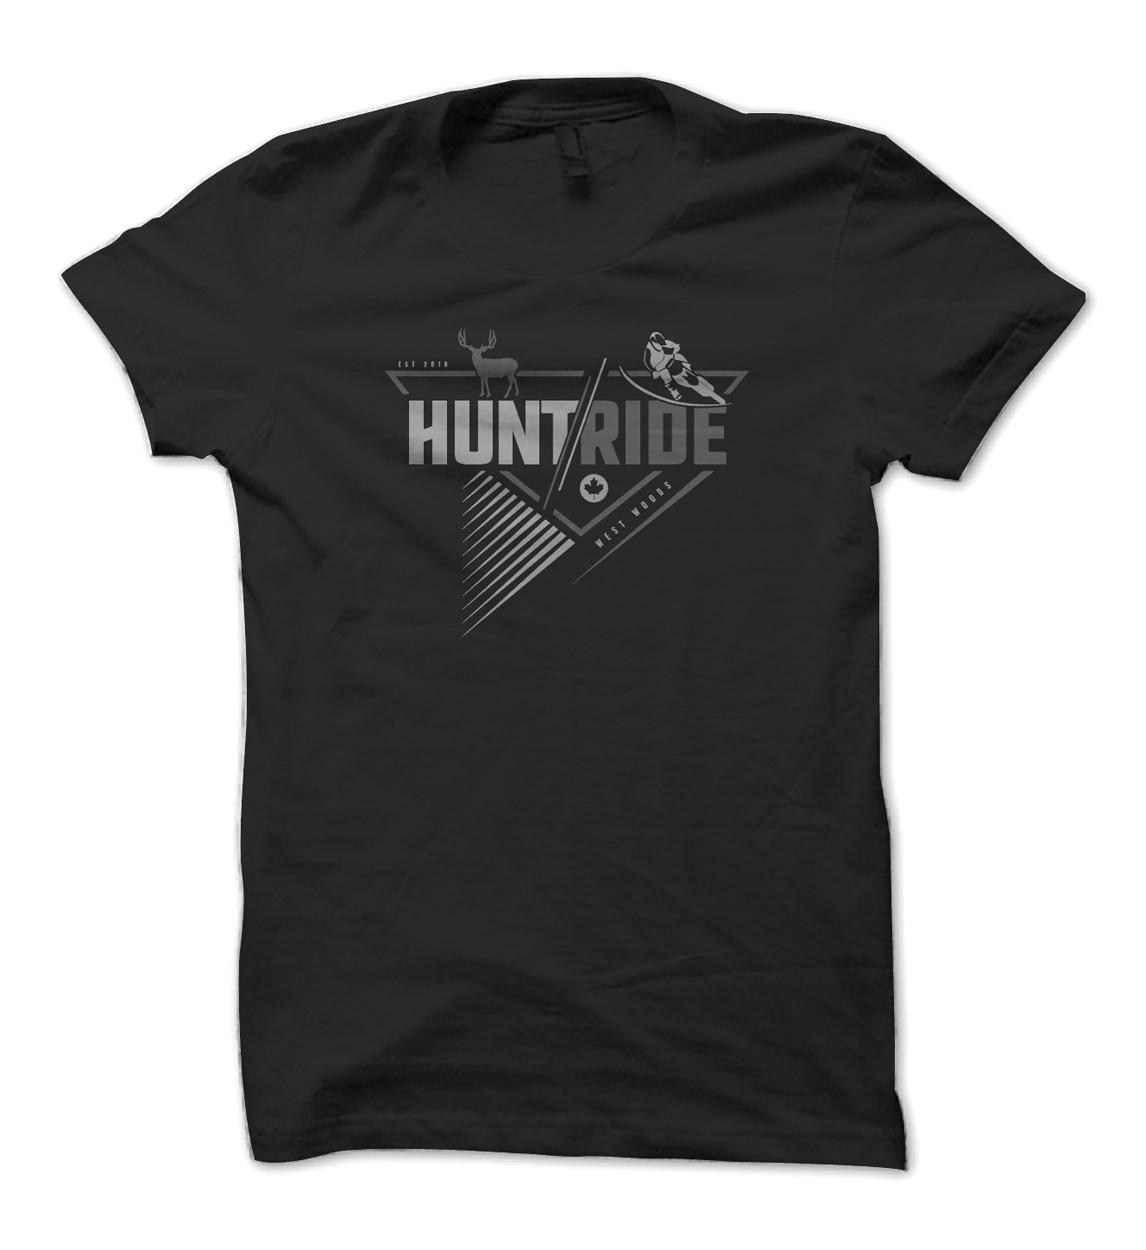 West Woods Motocross Hunting Shirt Design